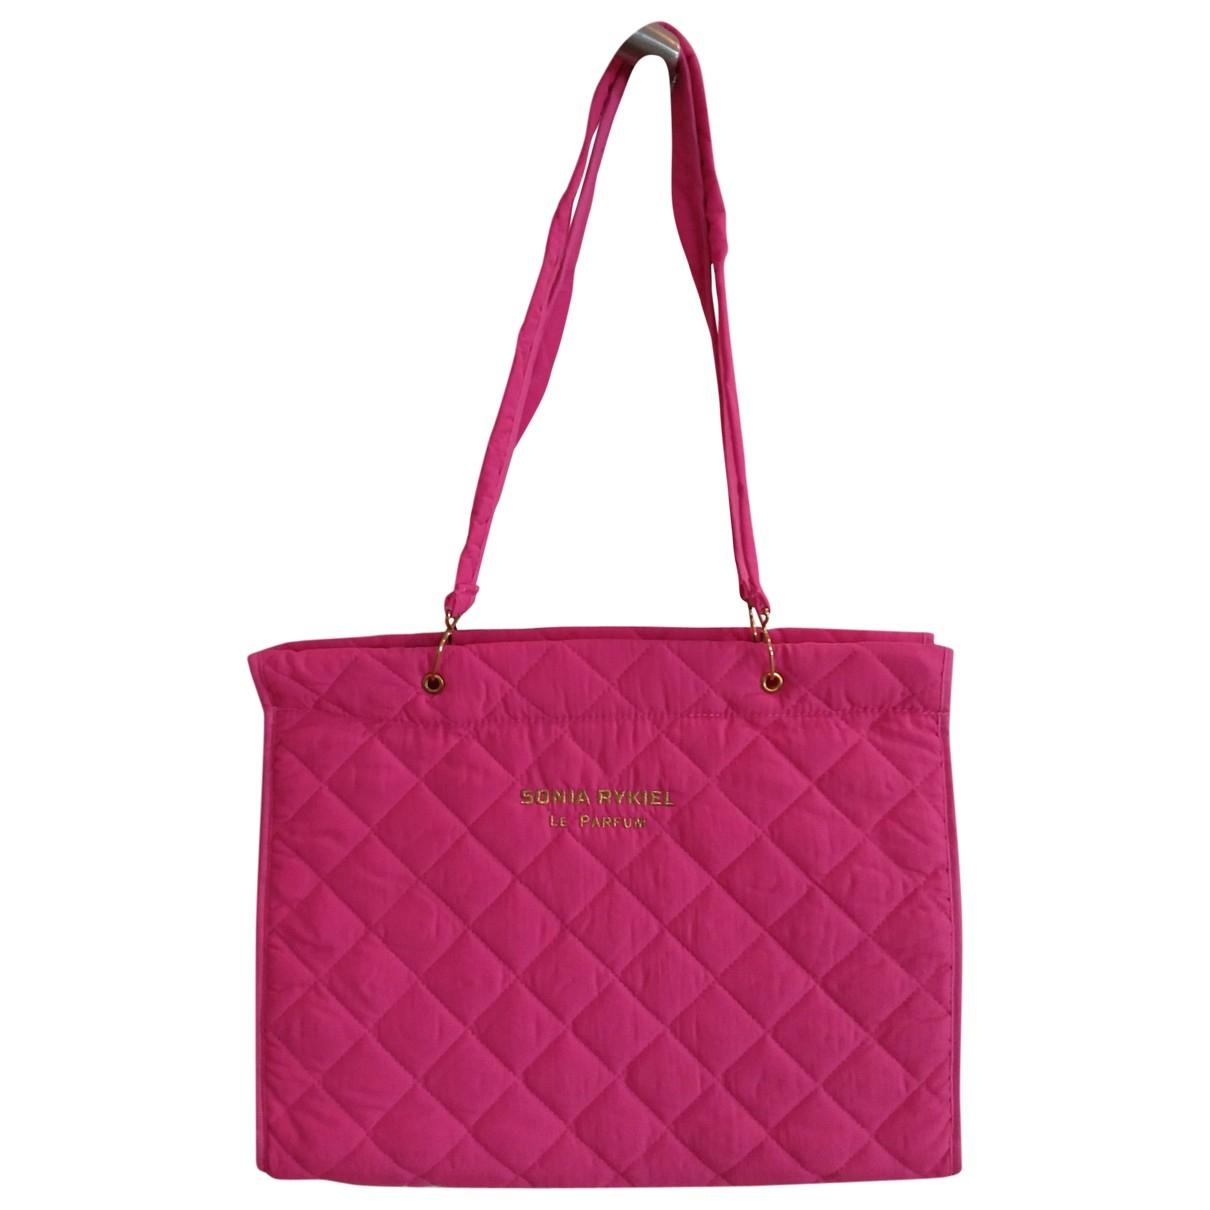 Sonia Rykiel \N Pink Cloth handbag for Women \N